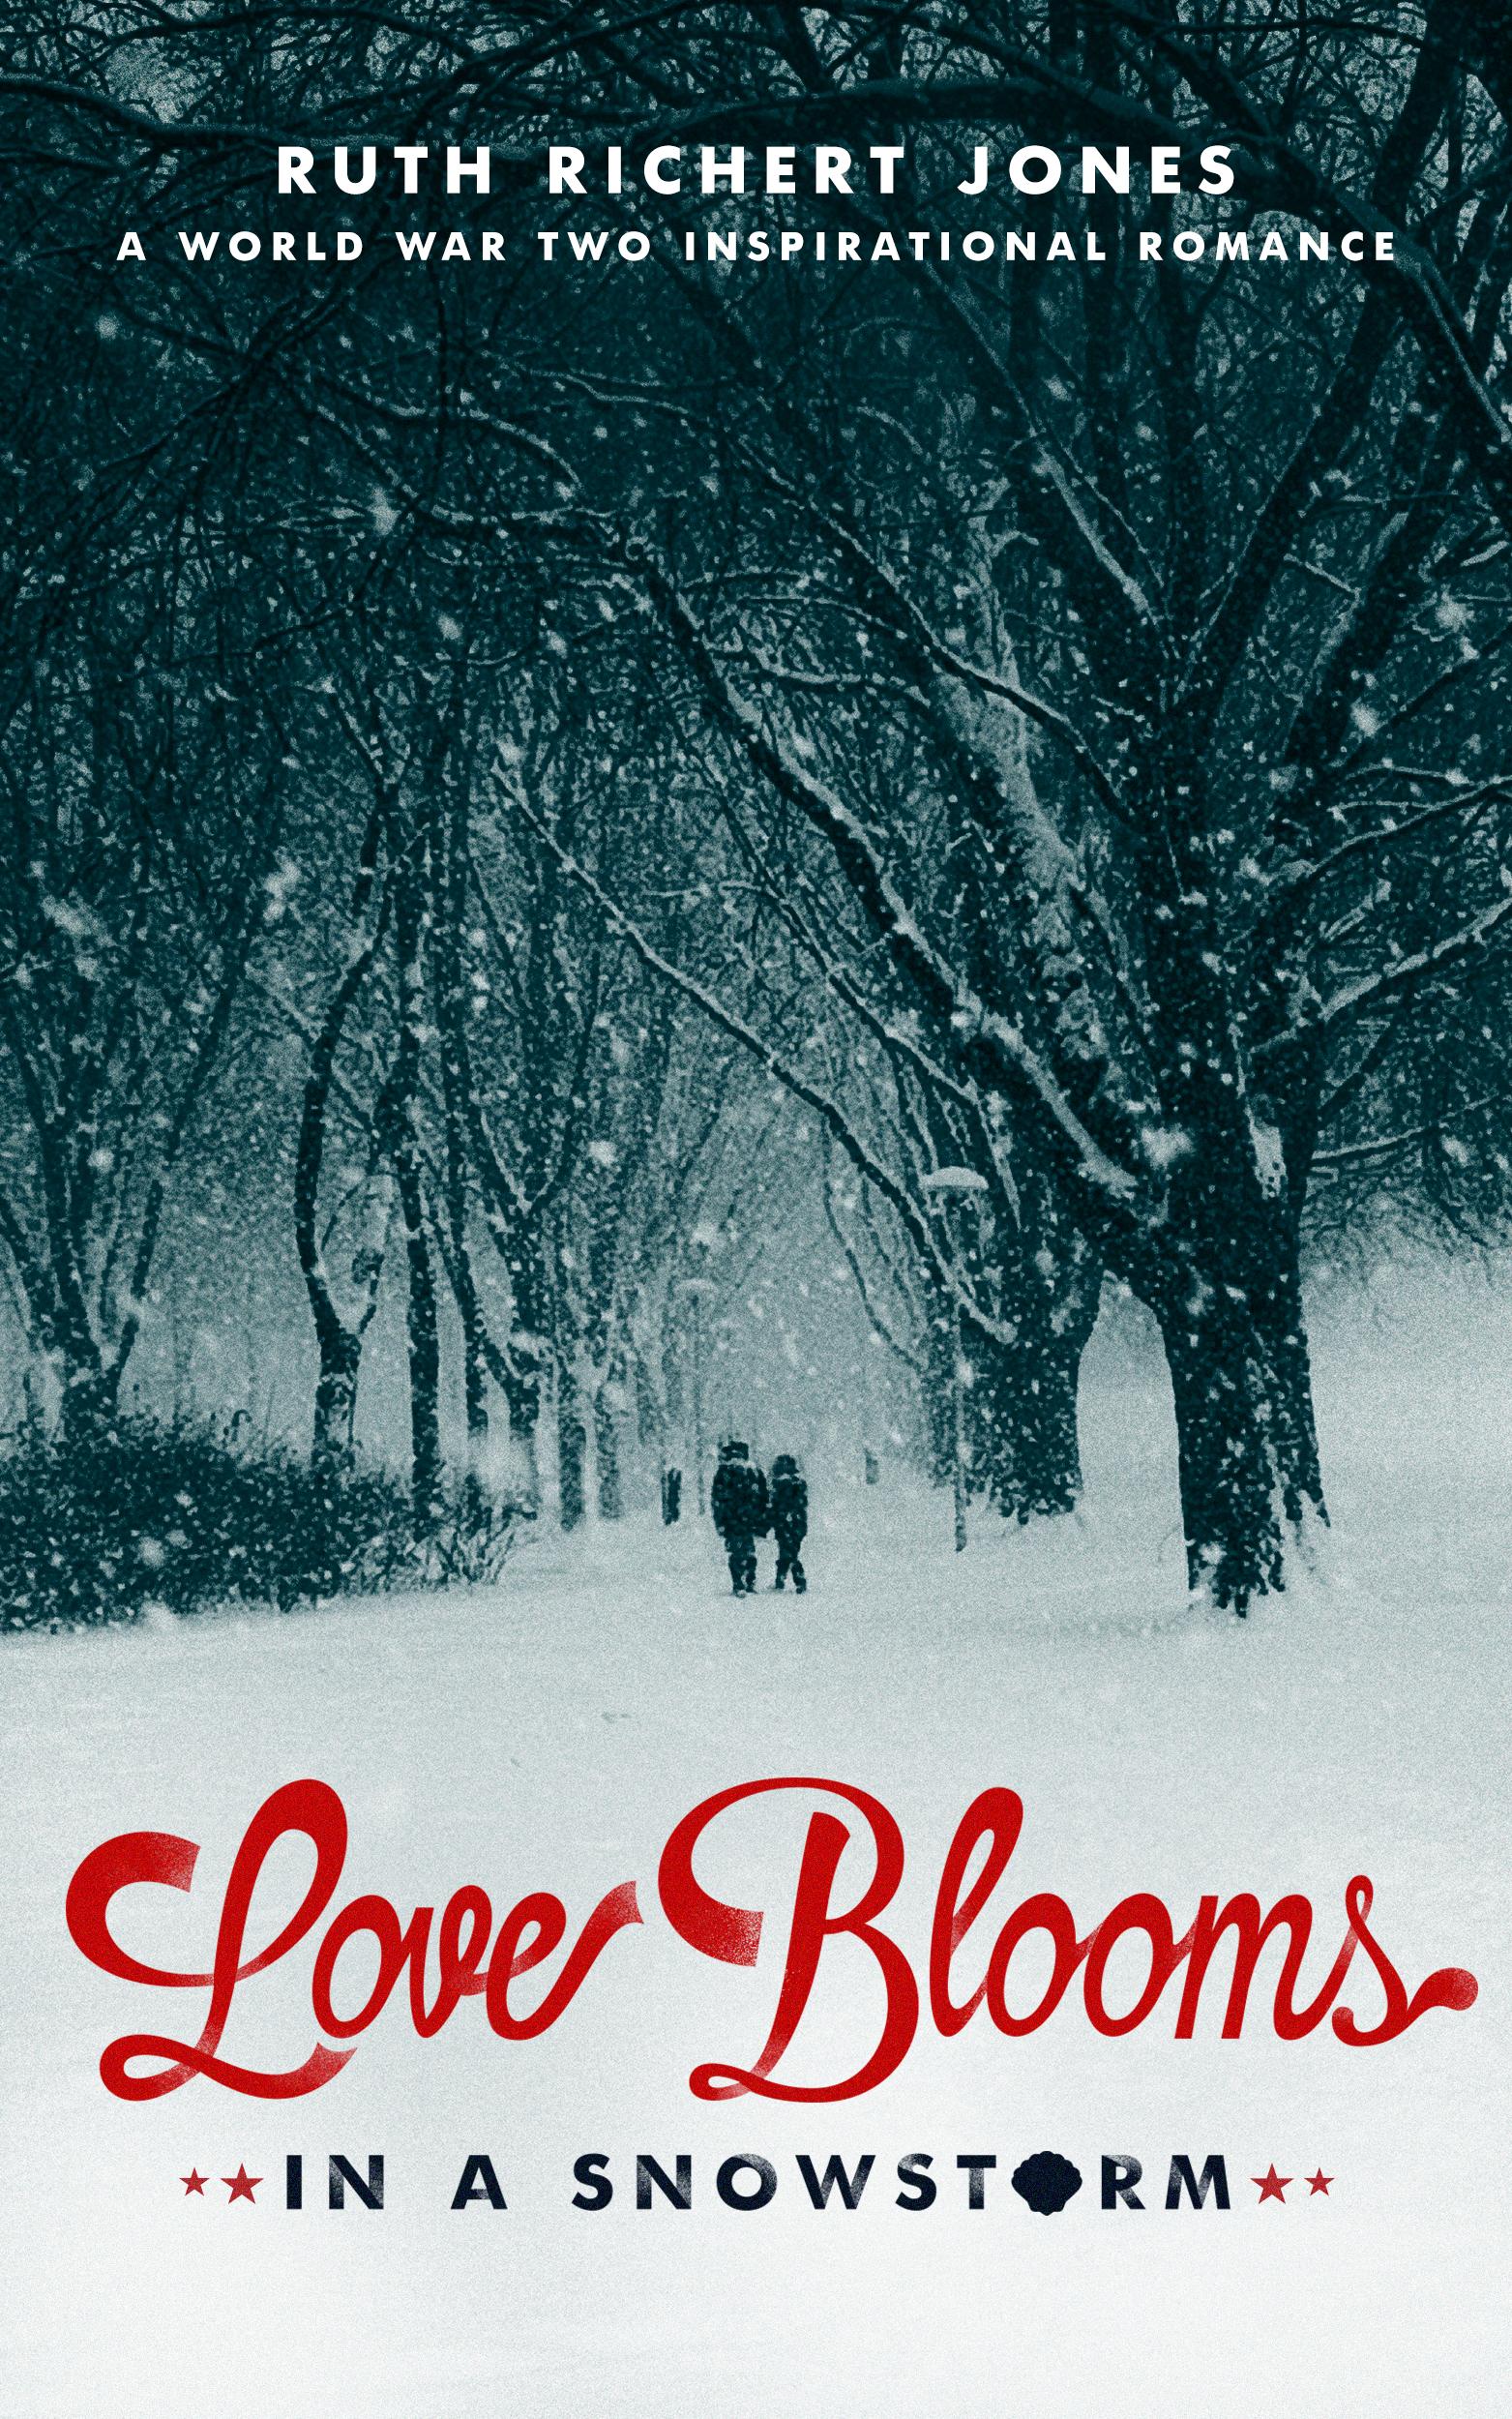 LoveBloomsCover_Final.jpg